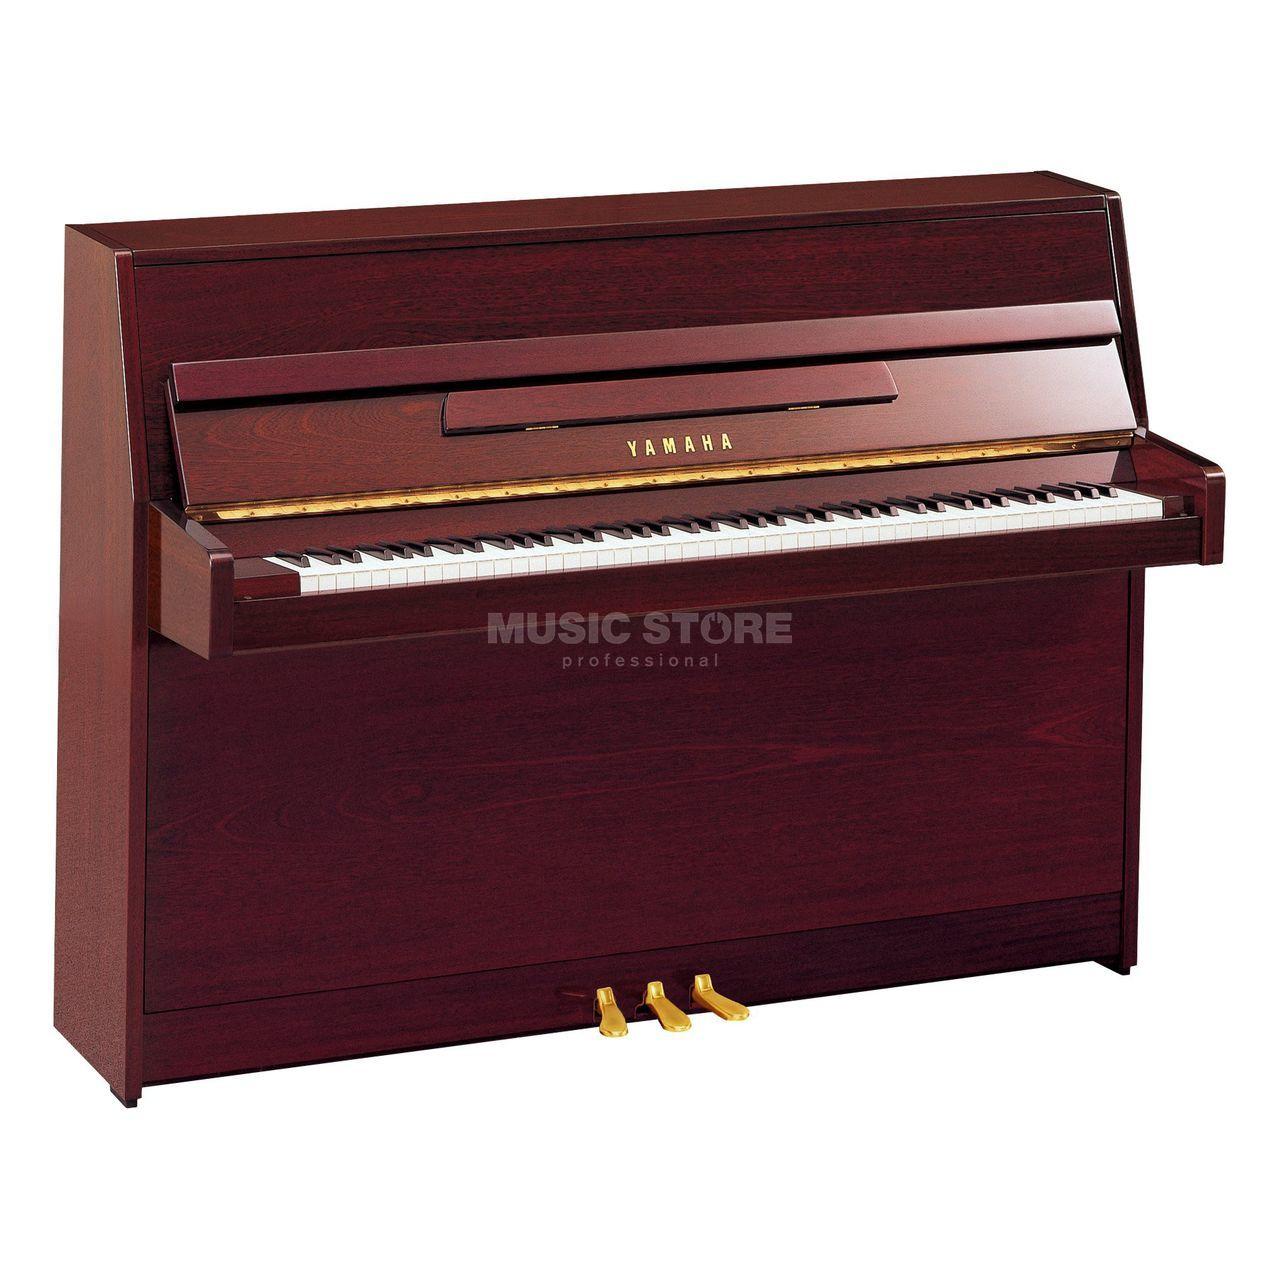 Yamaha b1 snc piano 109cm cherry natural satin for Yamaha dgx640c digital piano cherry